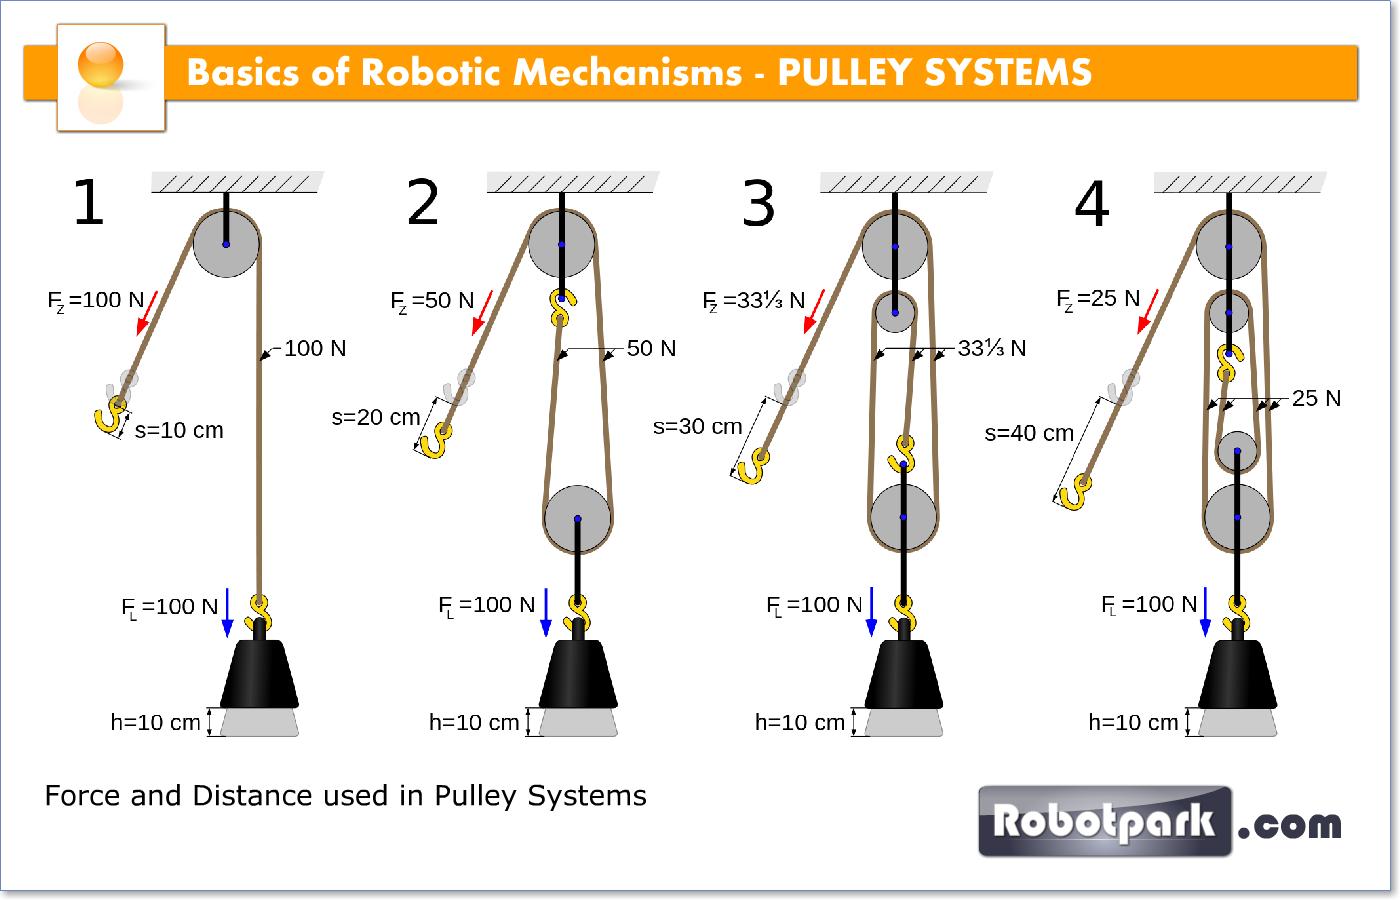 Robotic Mechanisms